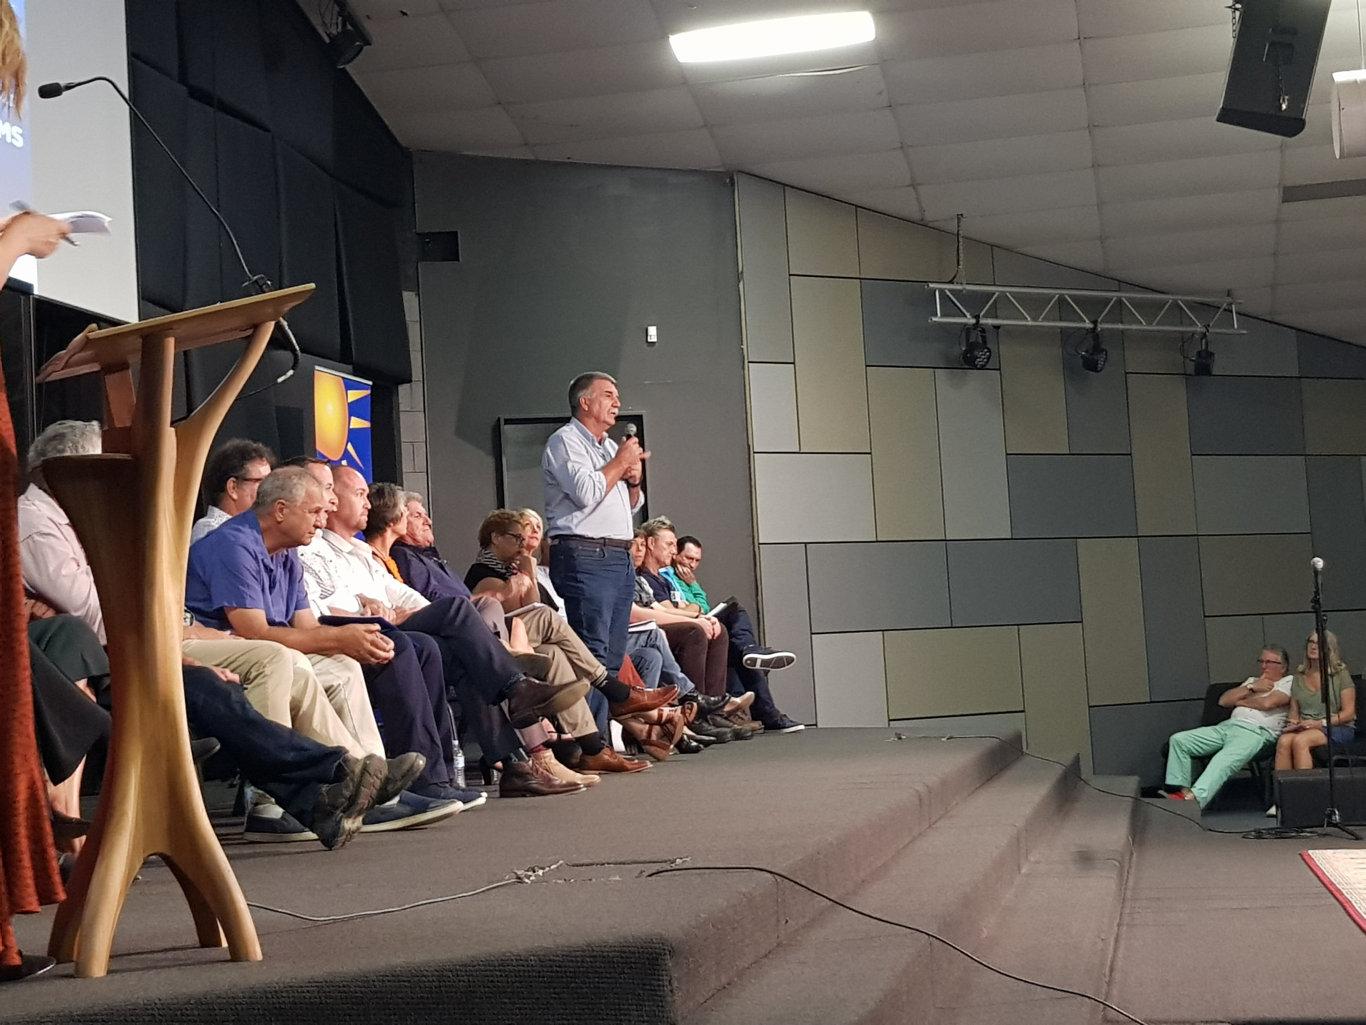 ON THE MIC: Joe Jurisevic addresses the crowd.